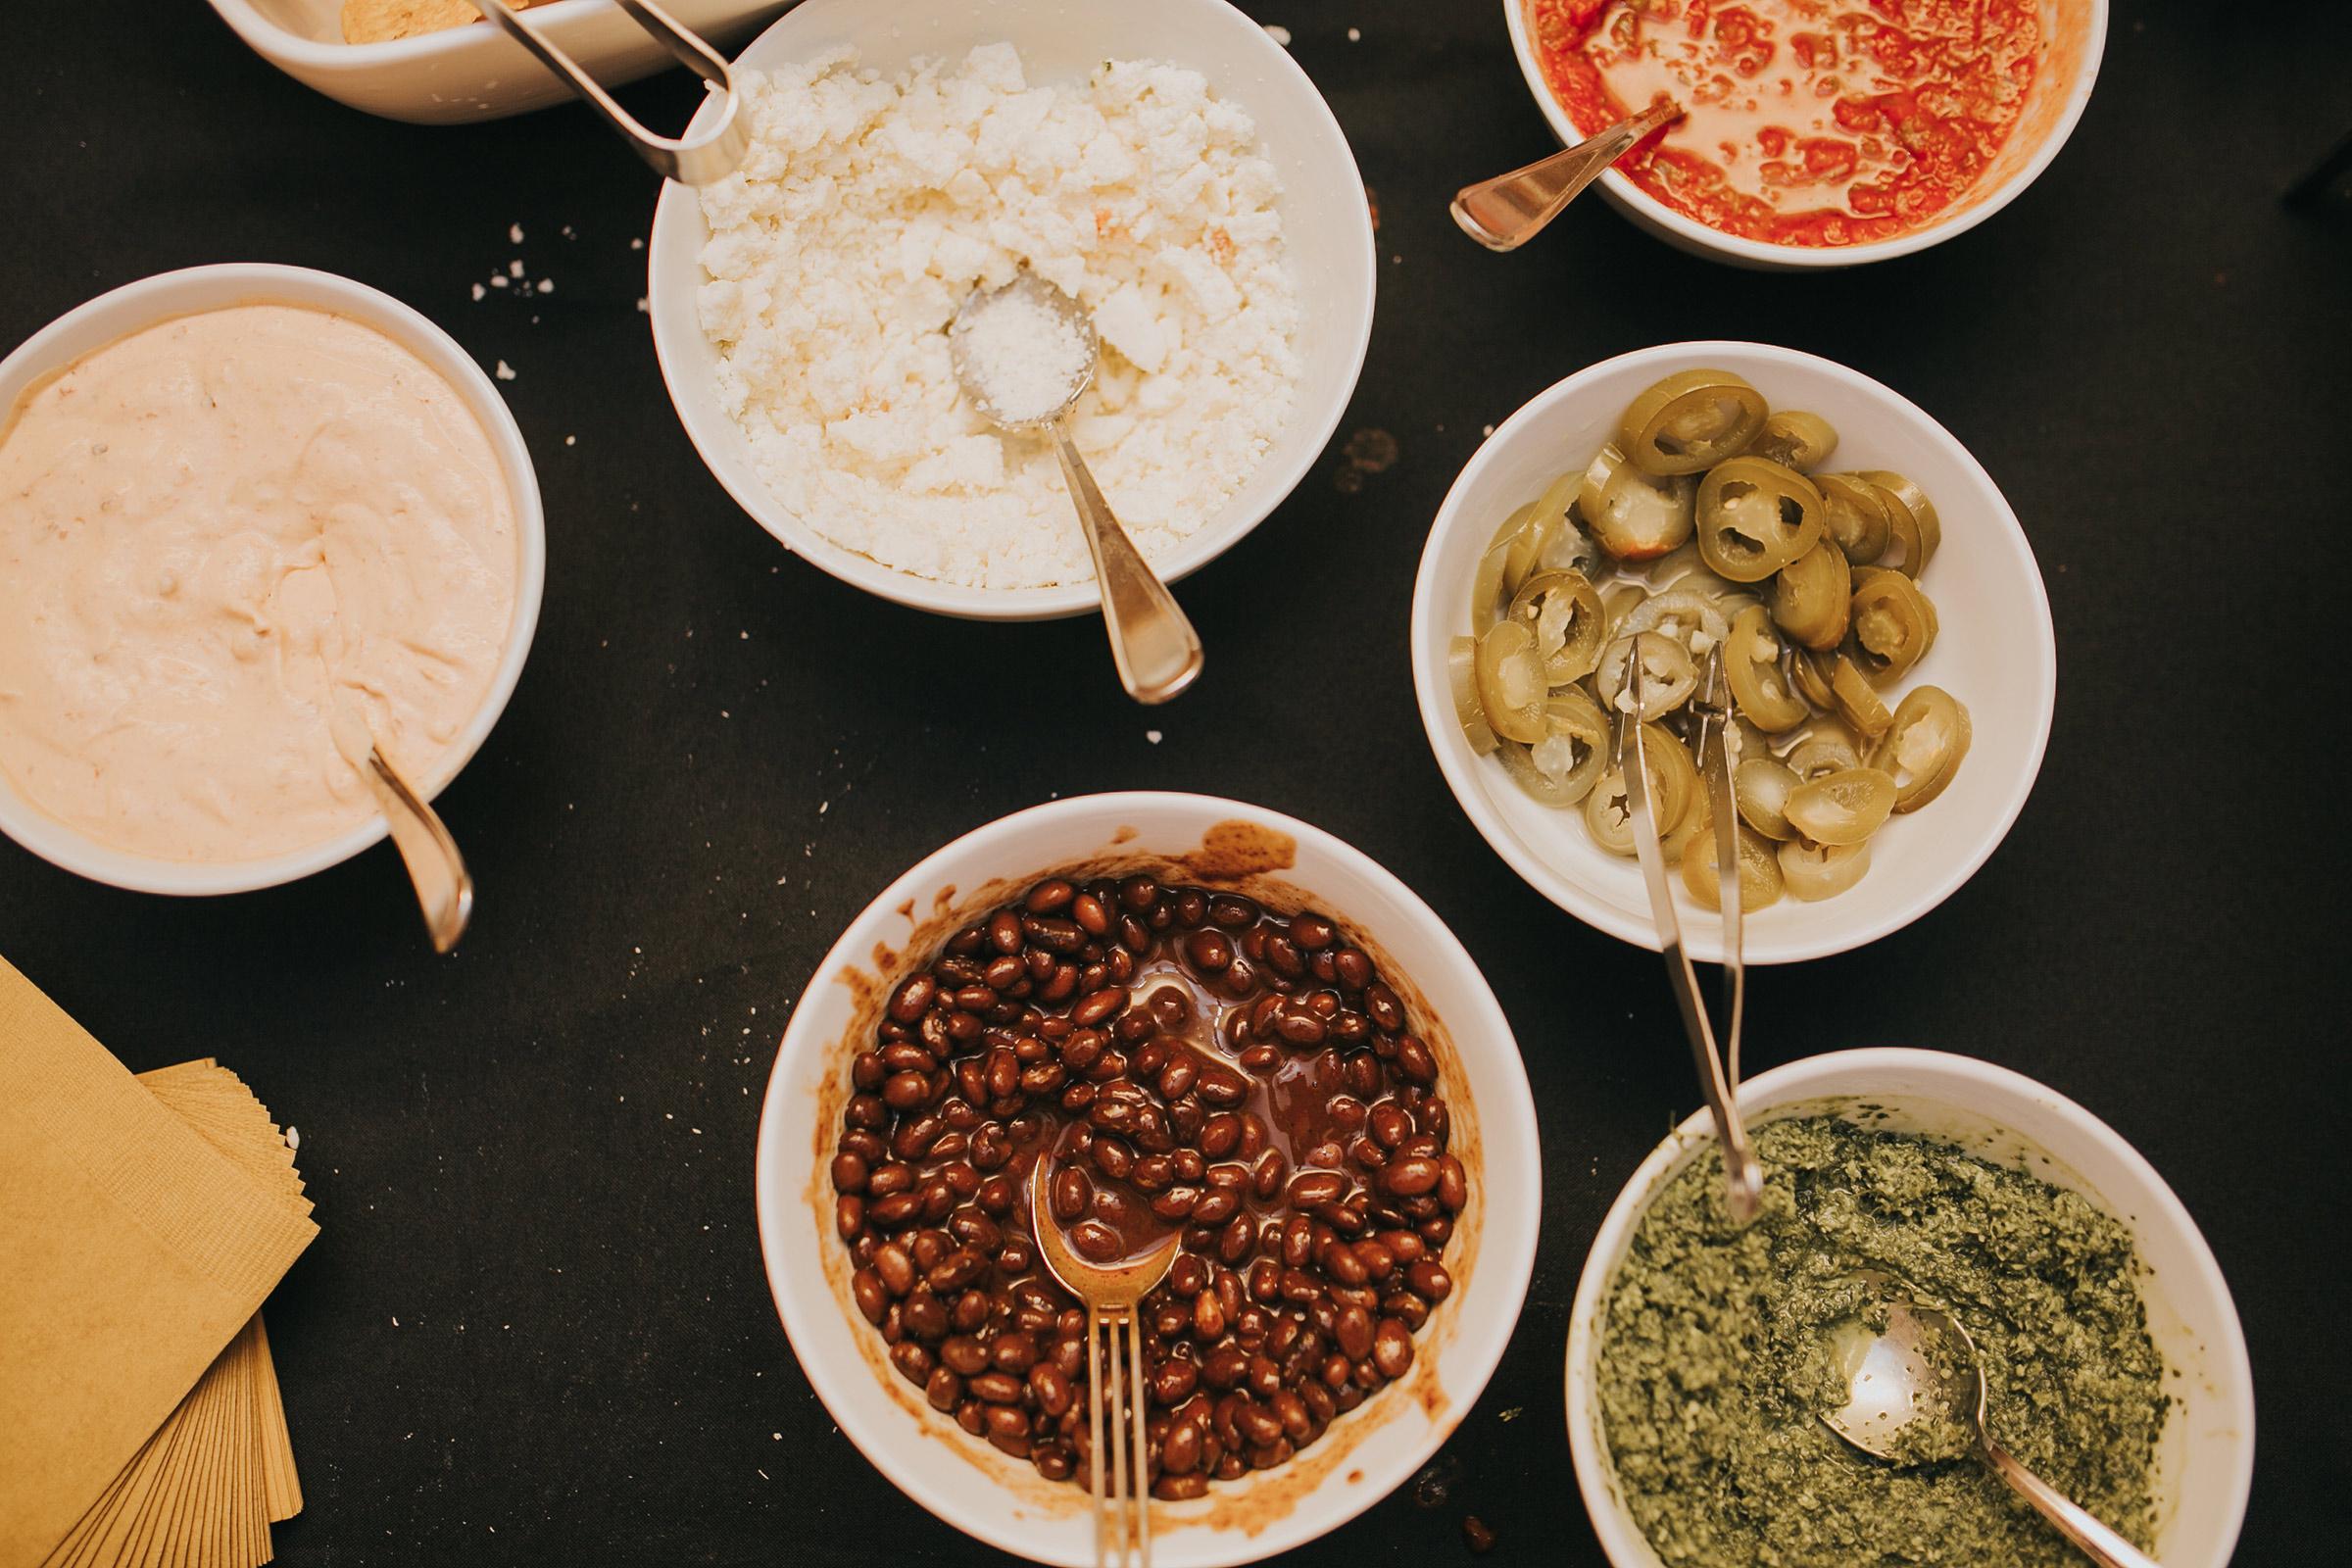 taco-bar-toppings-desmoines-iowa-art-center-raelyn-ramey-photography.jpg